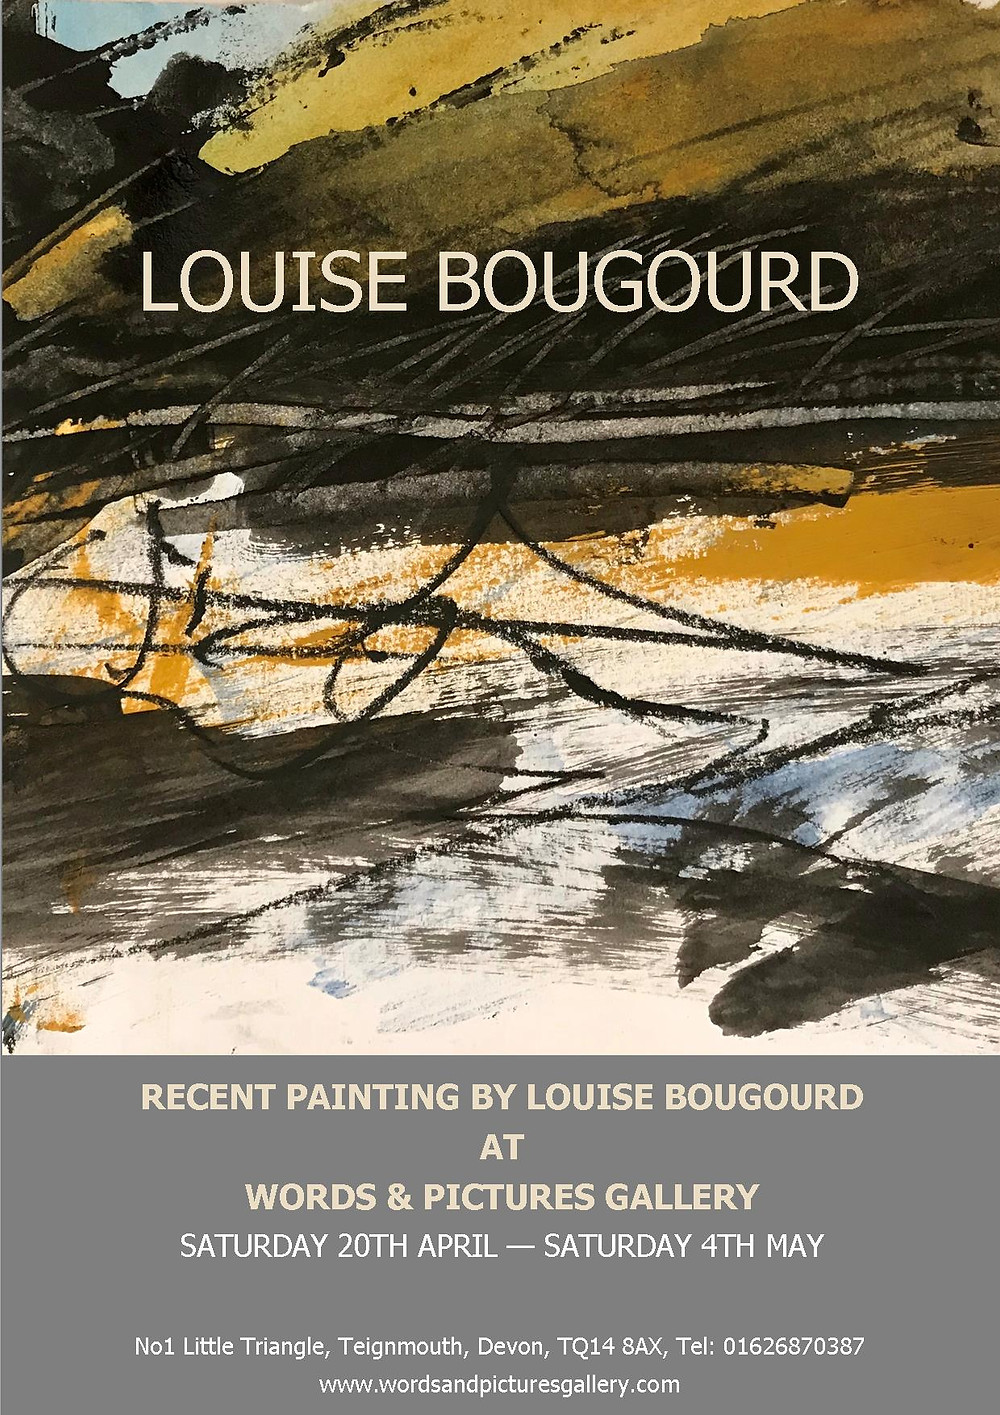 louise bougourd